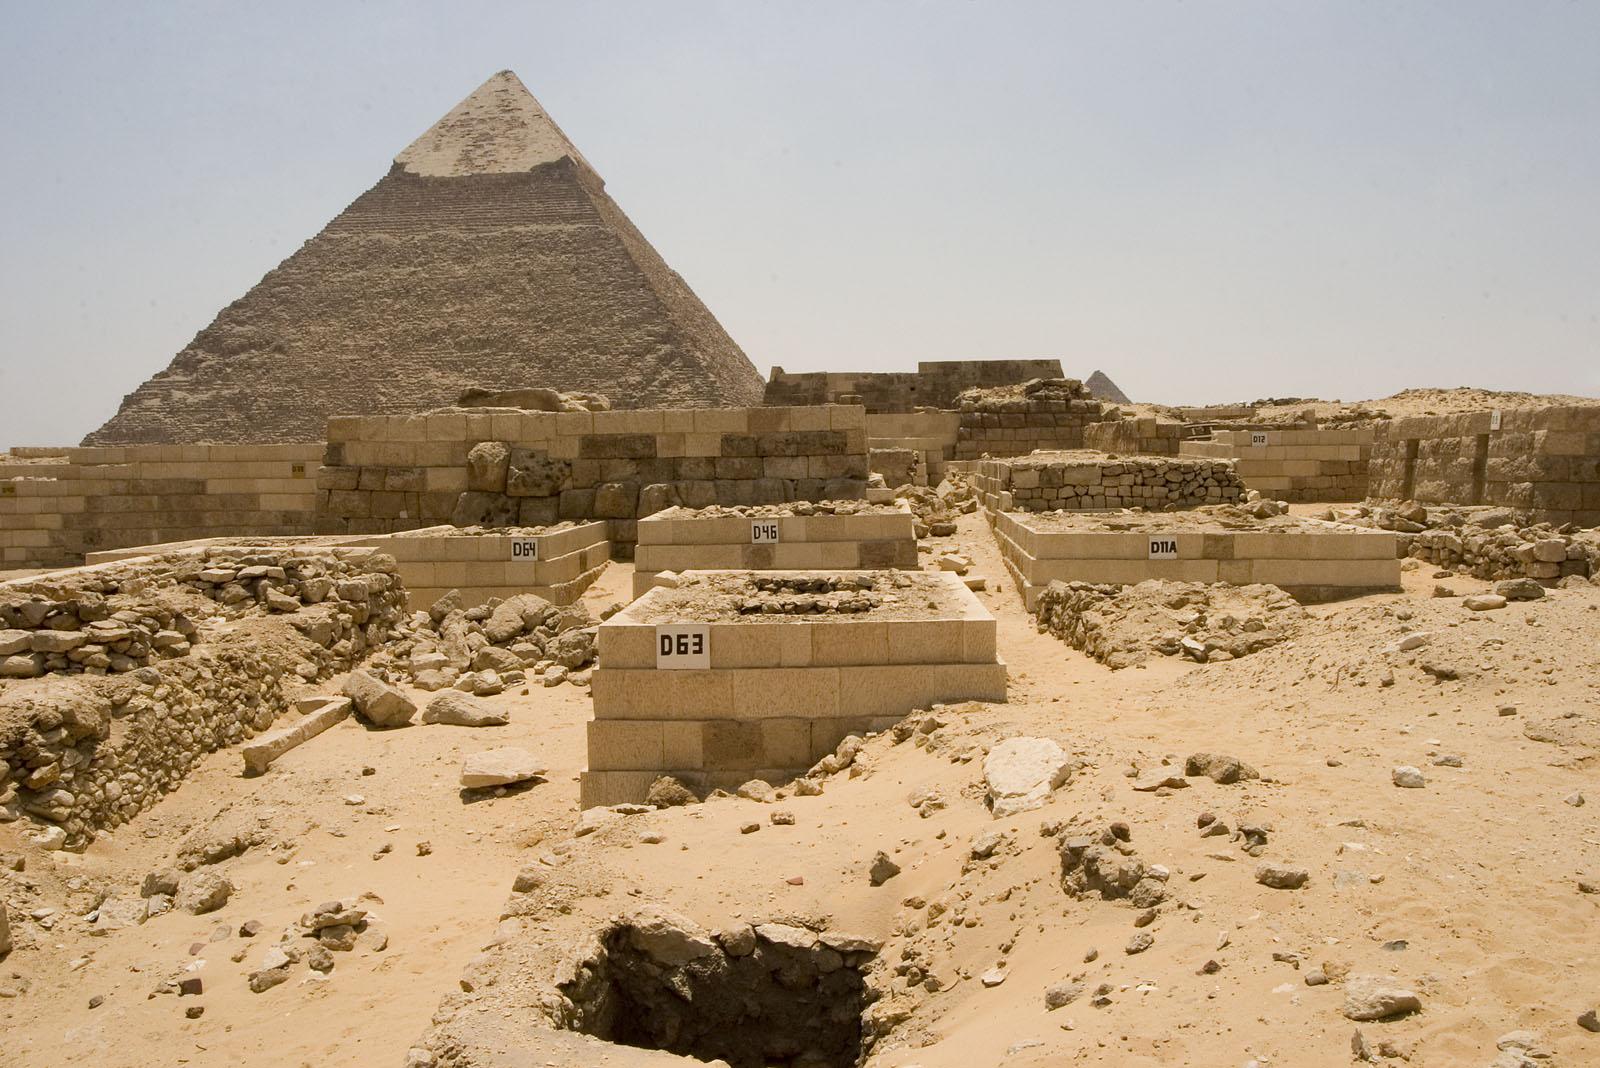 Western Cemetery: Site: Giza; View: D 63, D 64, D 46, D 11A